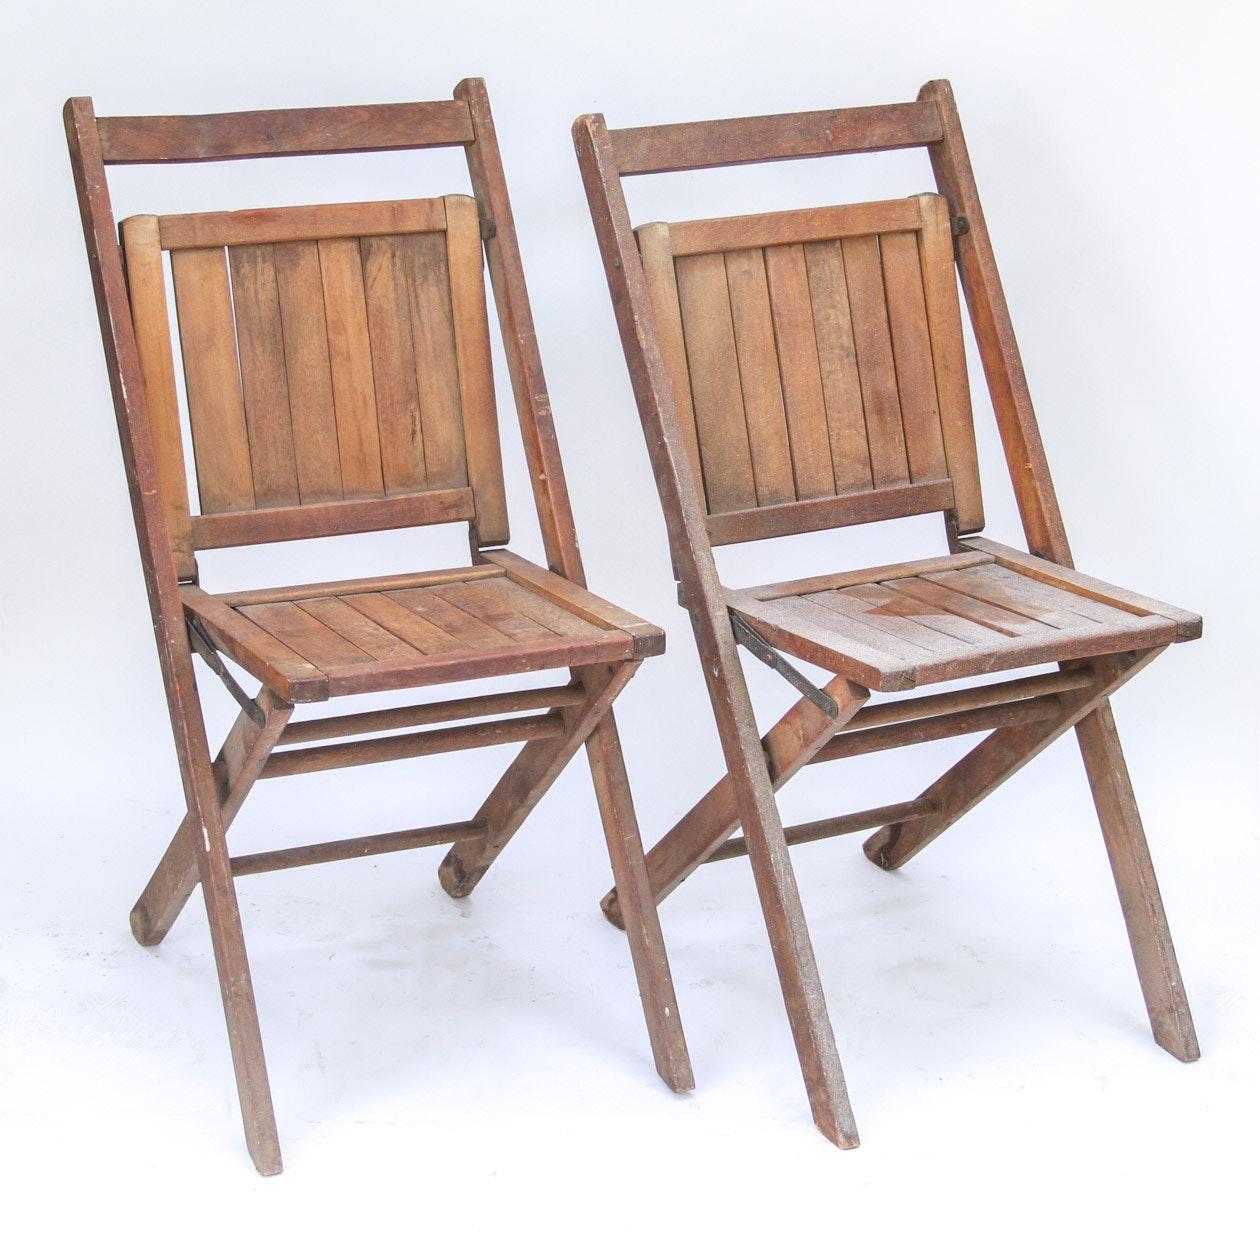 Pair Of Wood Slat Antique Teak Folding Chairs ...